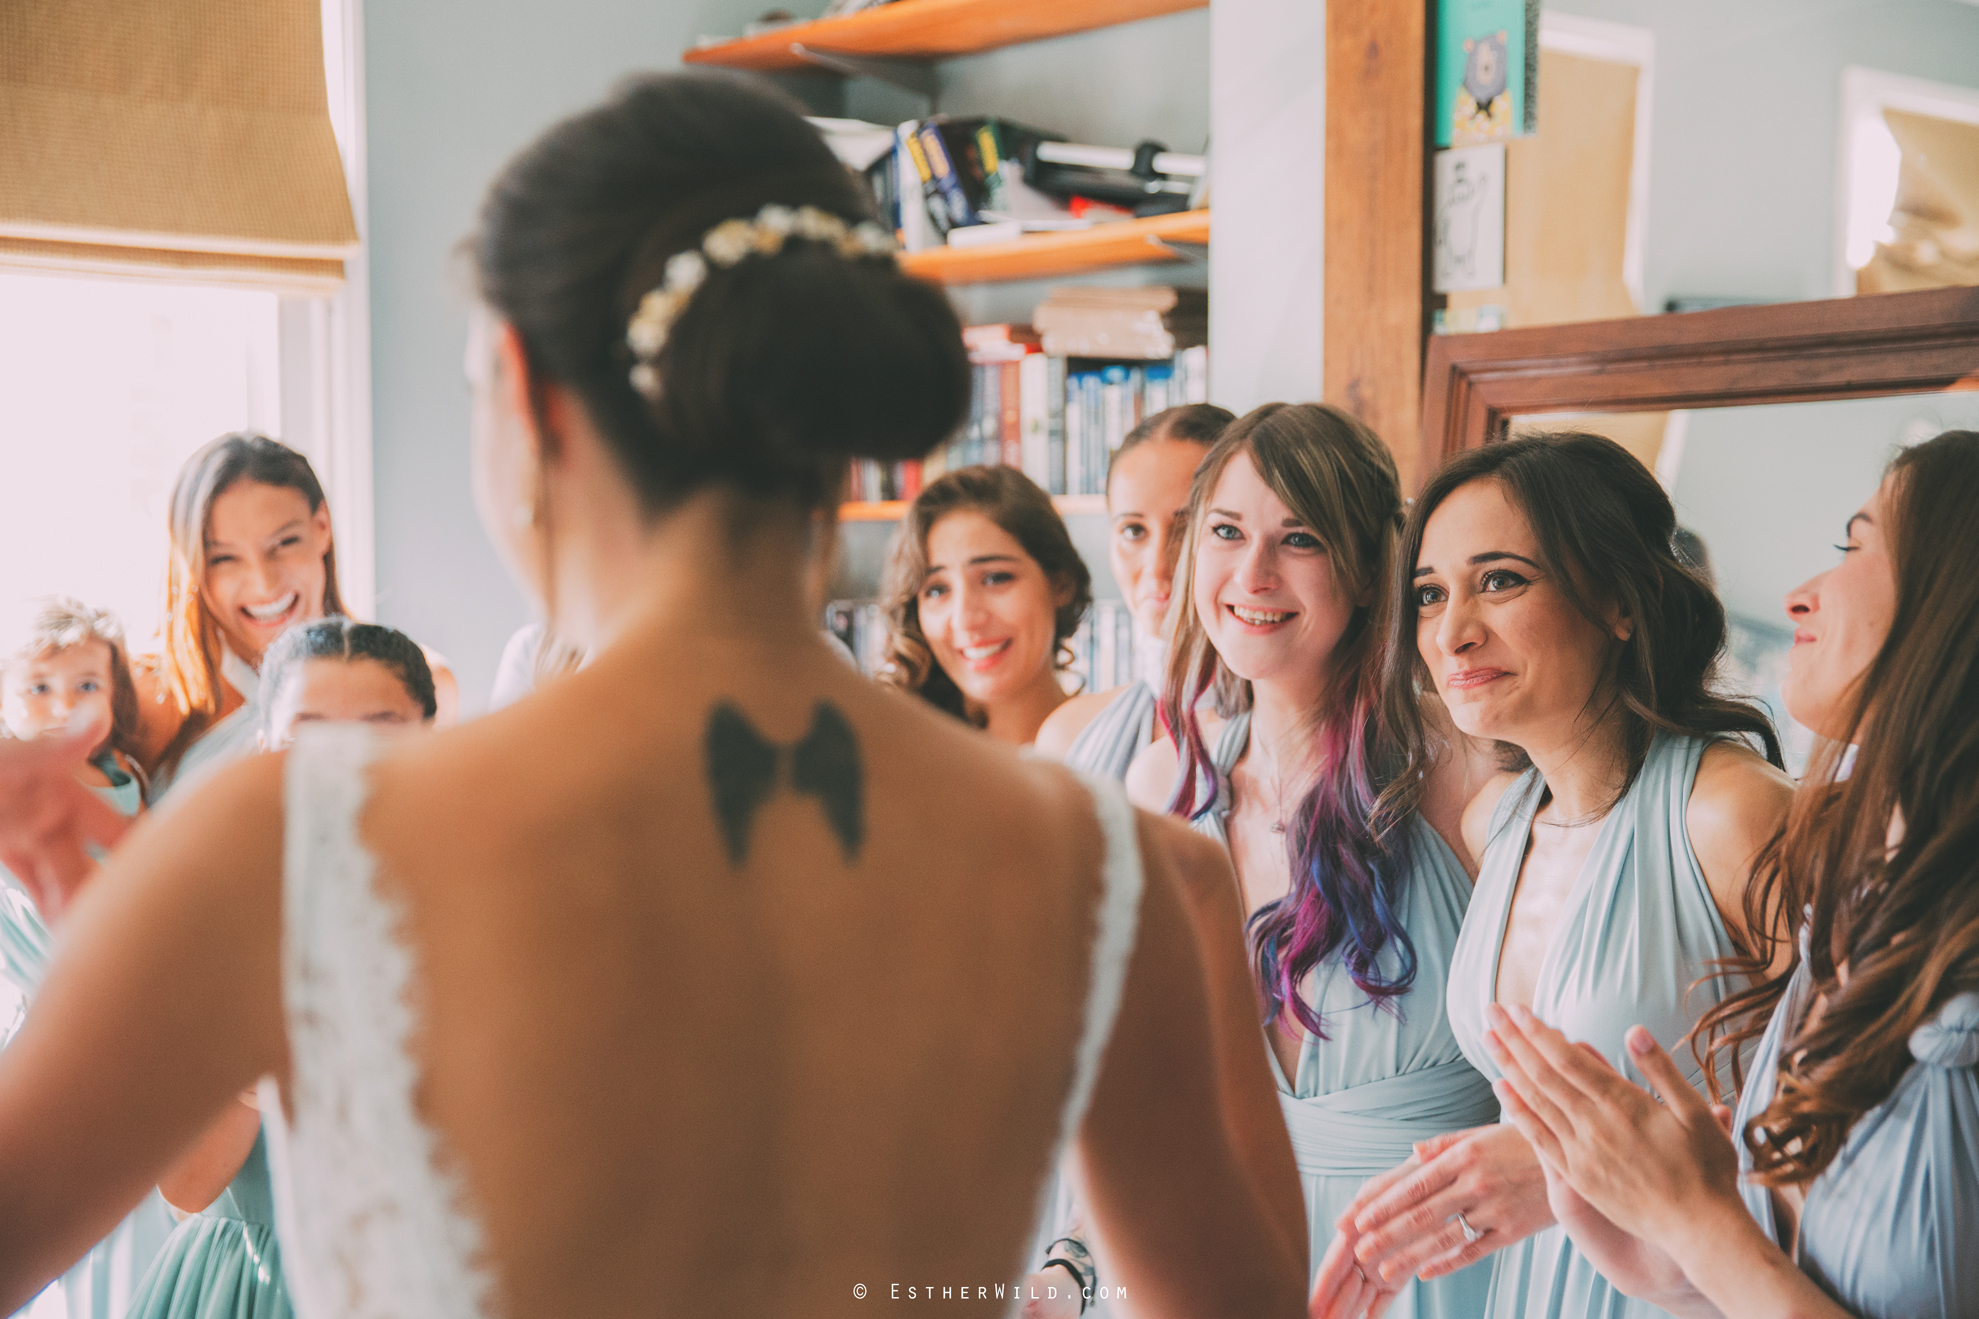 Islington_Town_Hall_Wedding_London_Photographer_Esther_Wild_IMG_4527.jpg